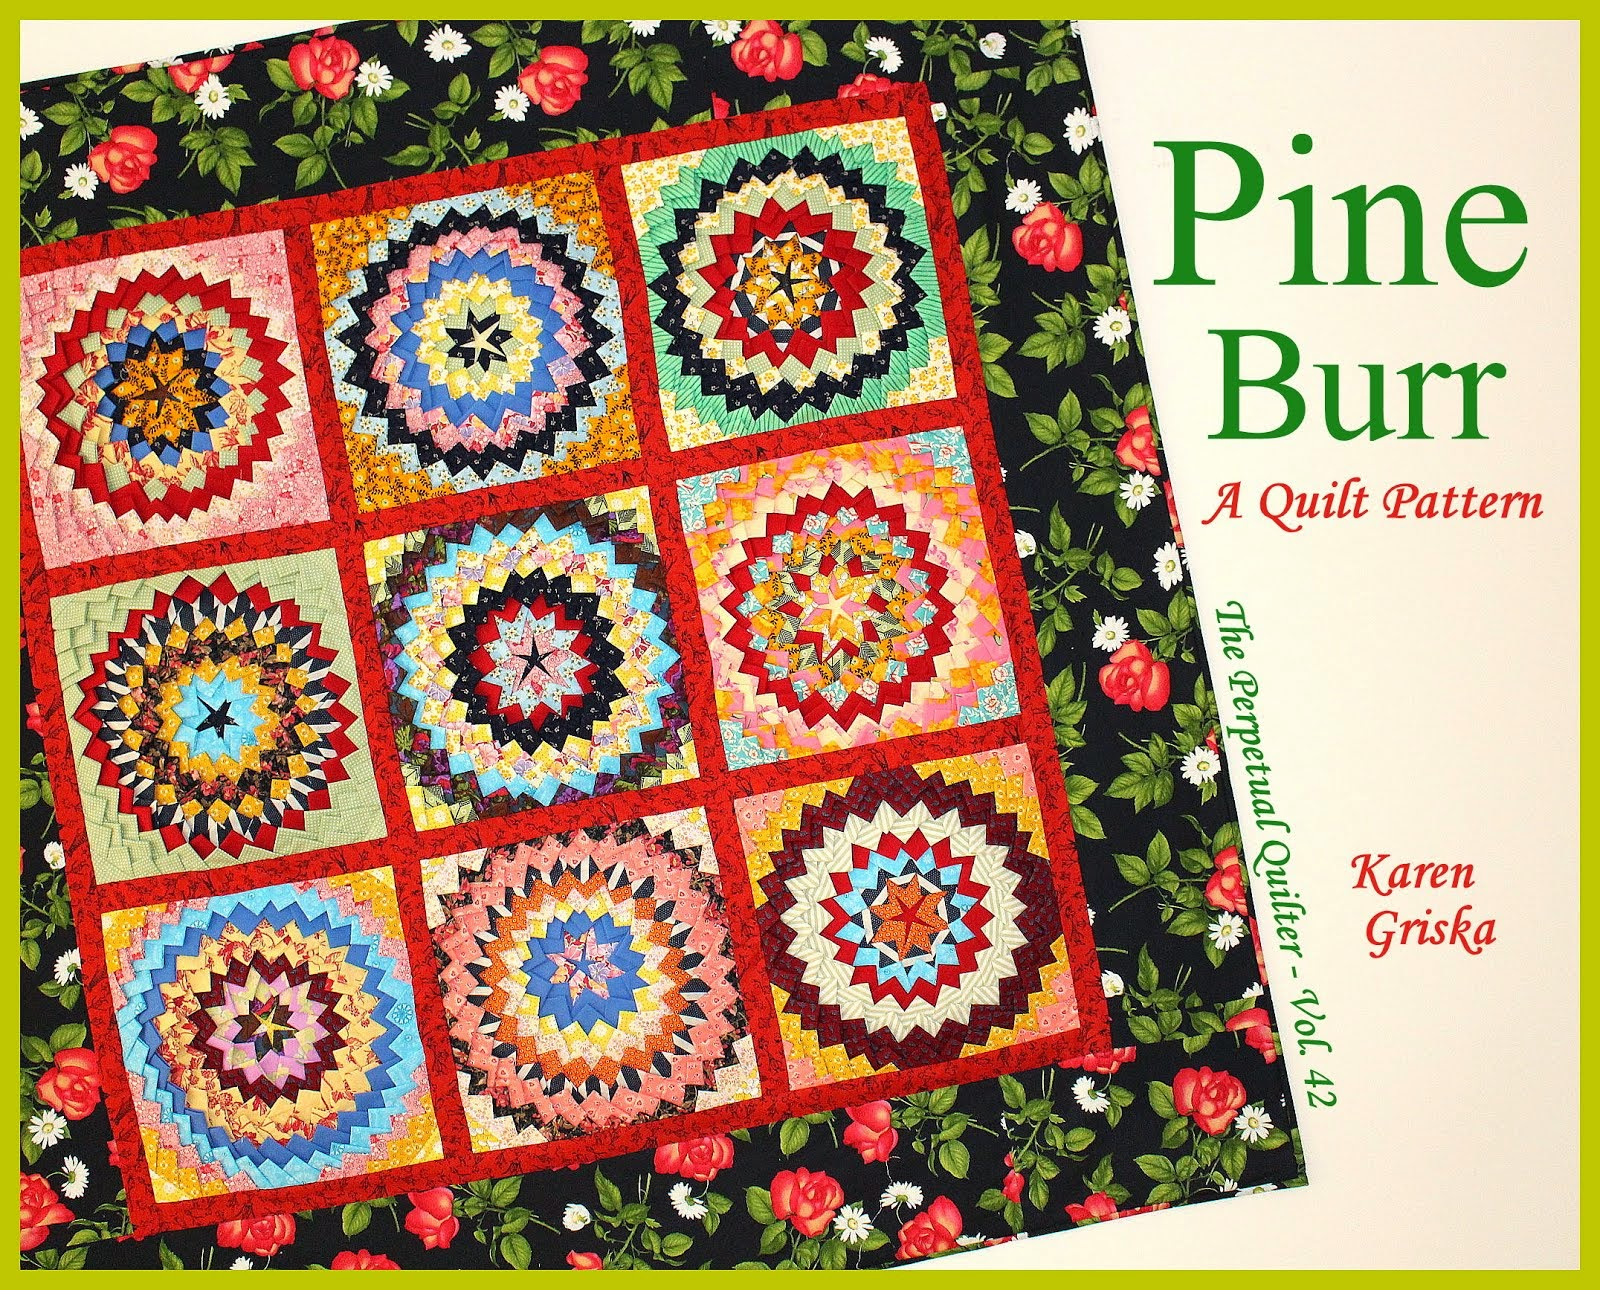 Fantastic Pine Burr Quilt!